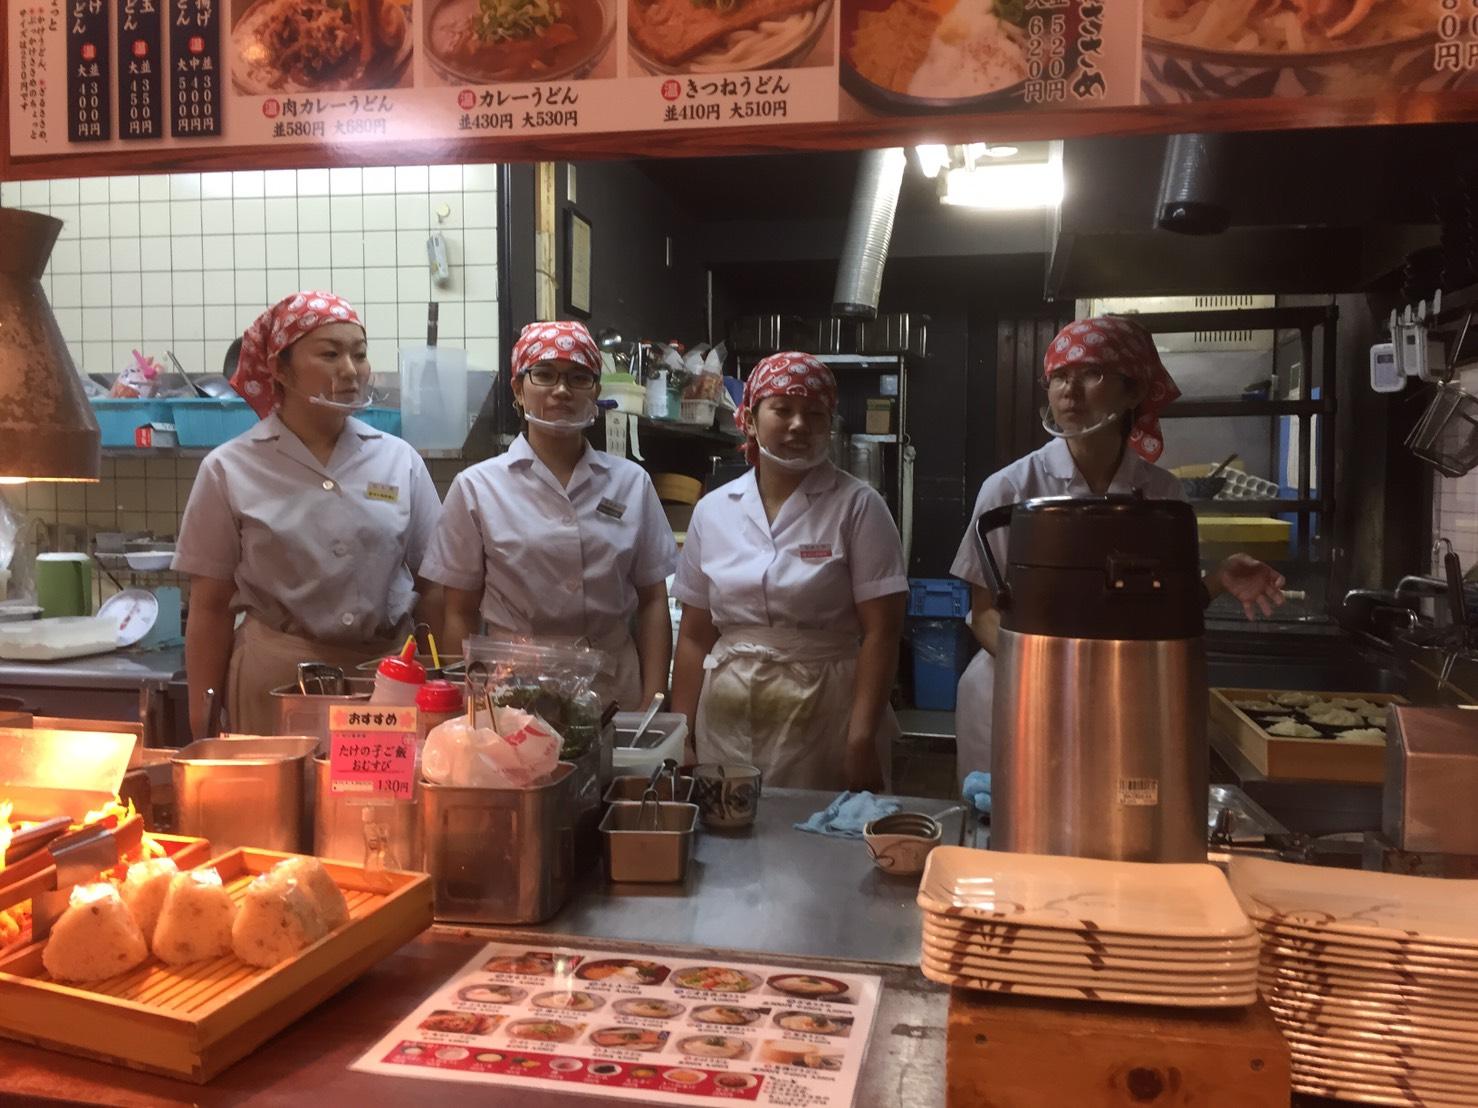 金比羅製麺 ミング高槻市駅店